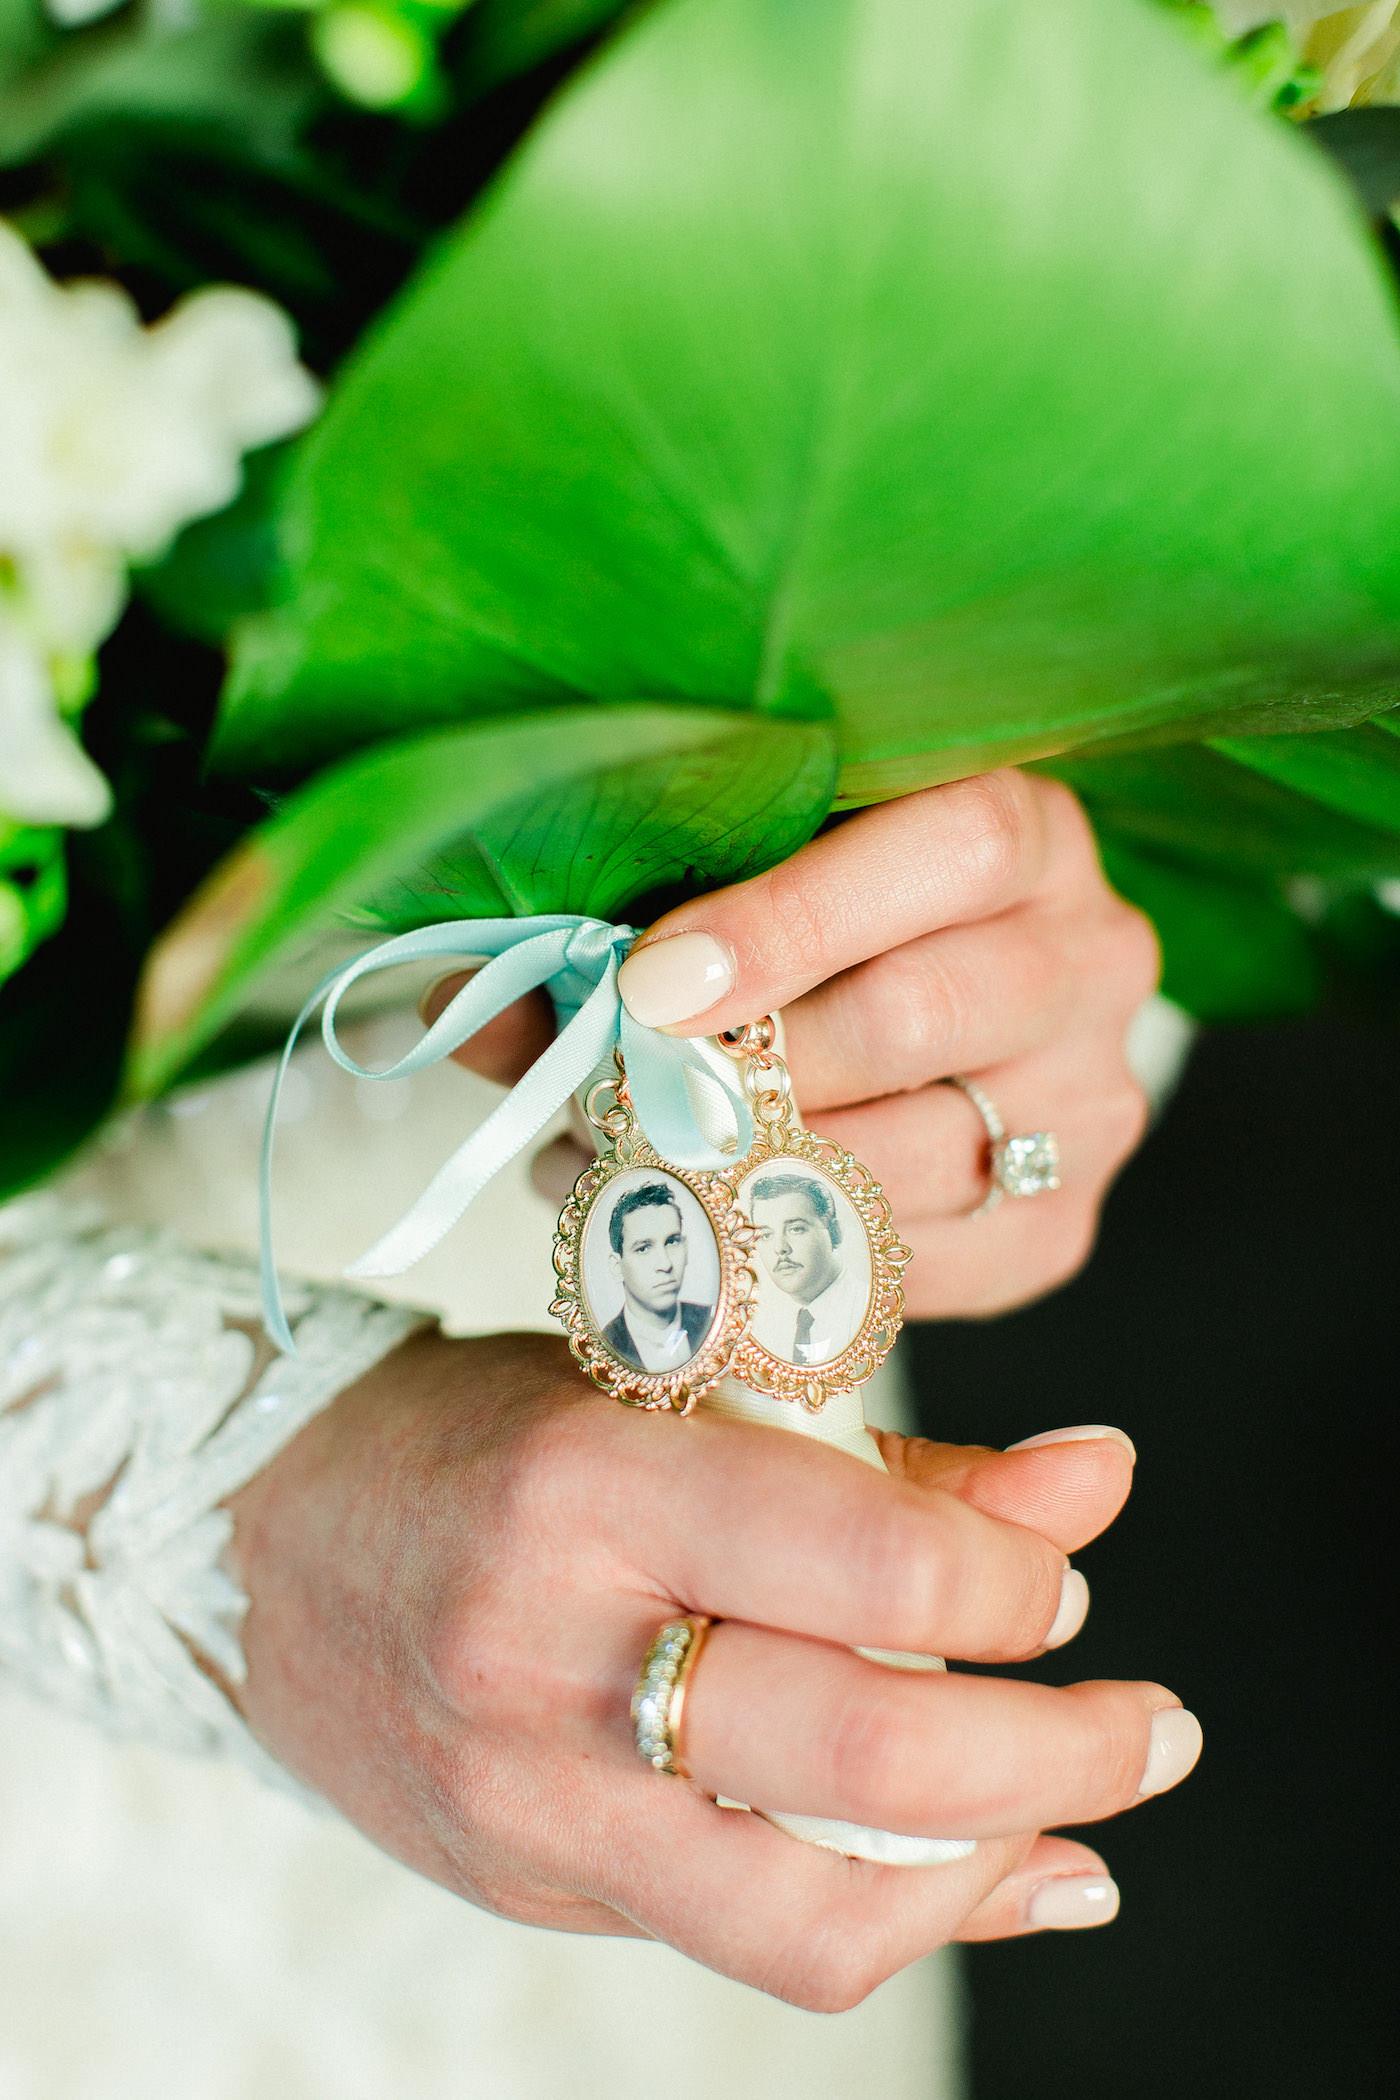 Vintage Inspired Wedding Bouquet Details, Heirloom Family Photos in Locket Carried Down the Aisle | Florida Wedding Planner Breezin' Weddings